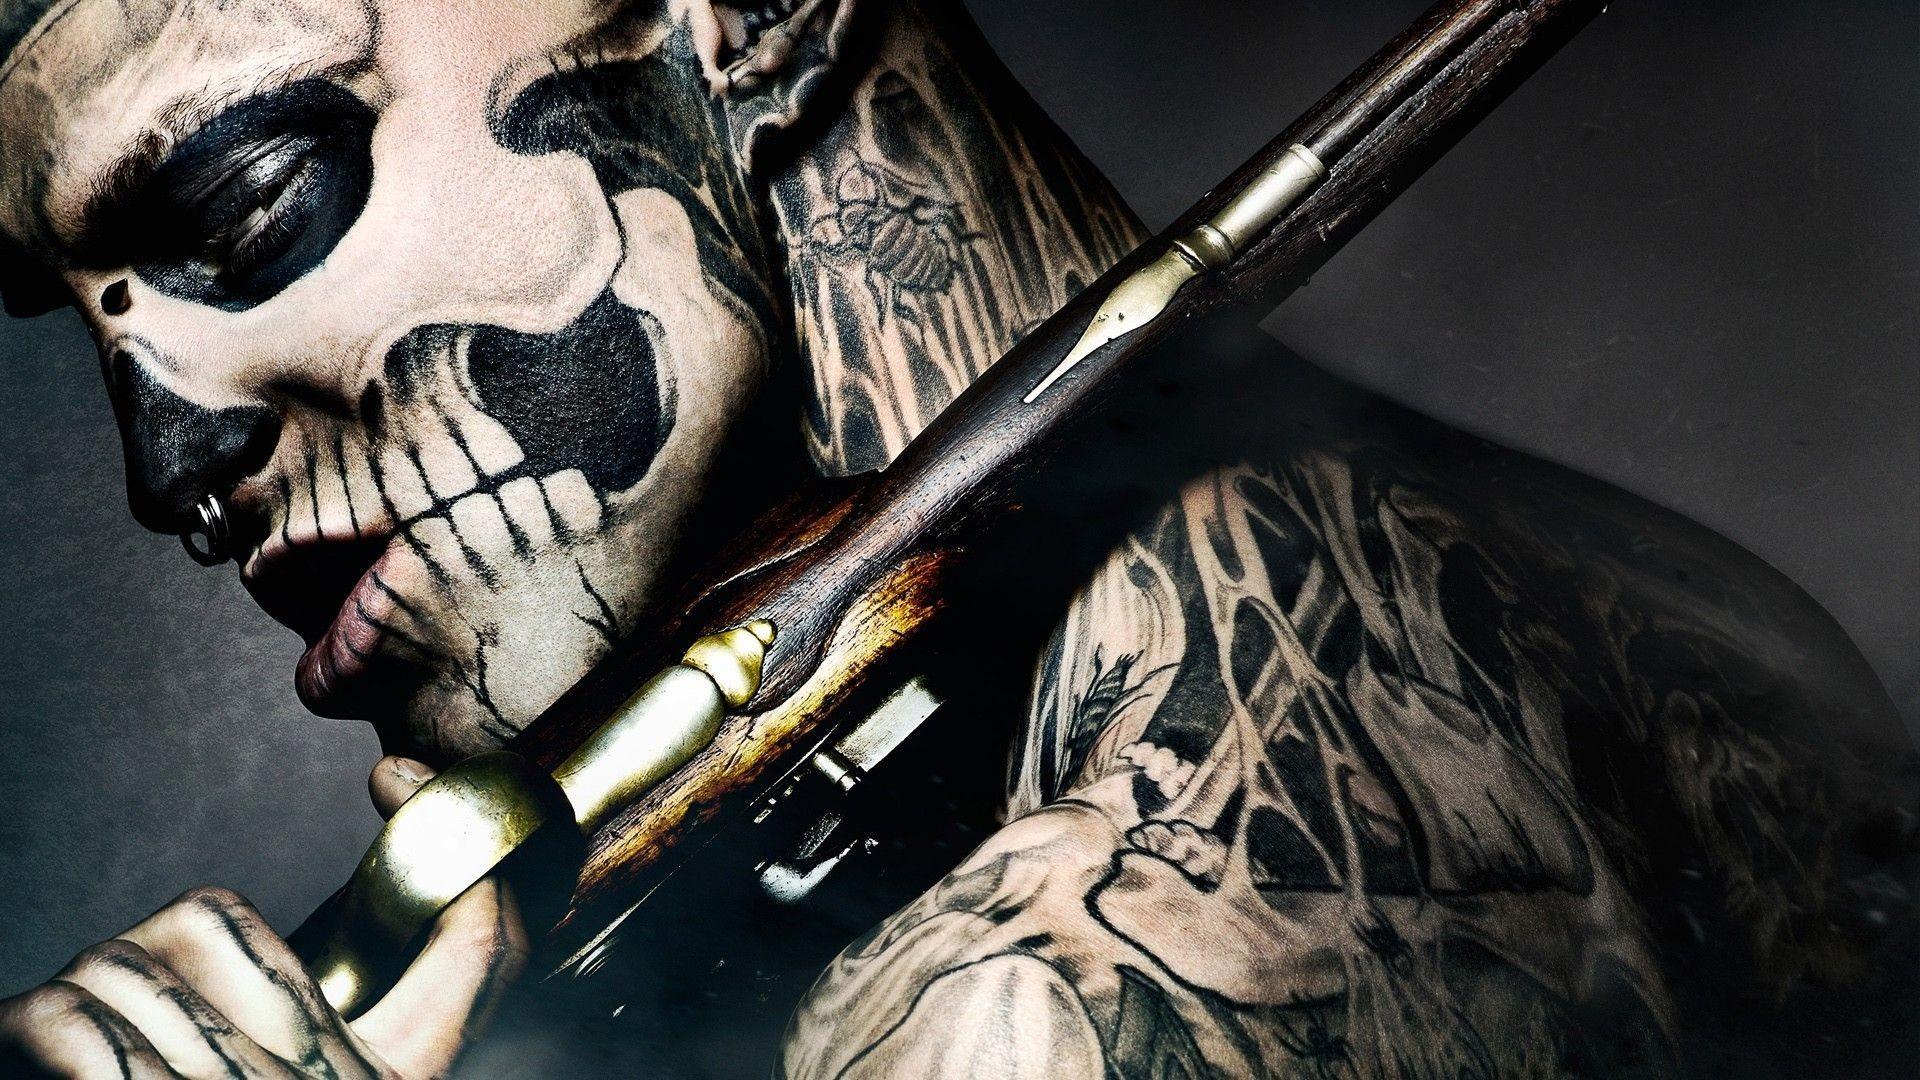 skeleton-tattoo-photography-hd-wallpaper-1920×1080-9888.jpg